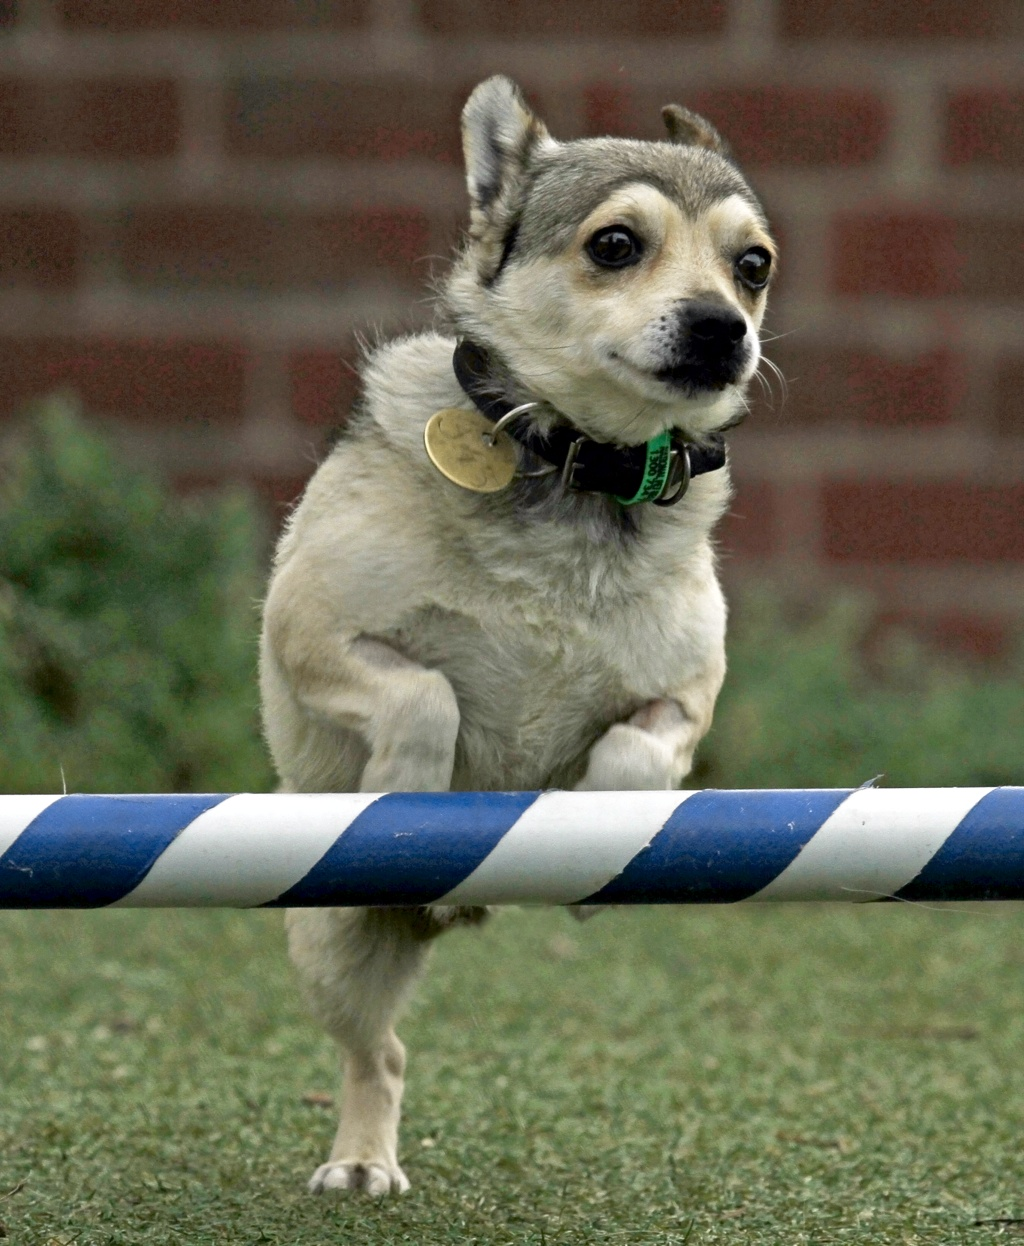 Astro Boy - Major Milestones - The Lost Dogs' Home